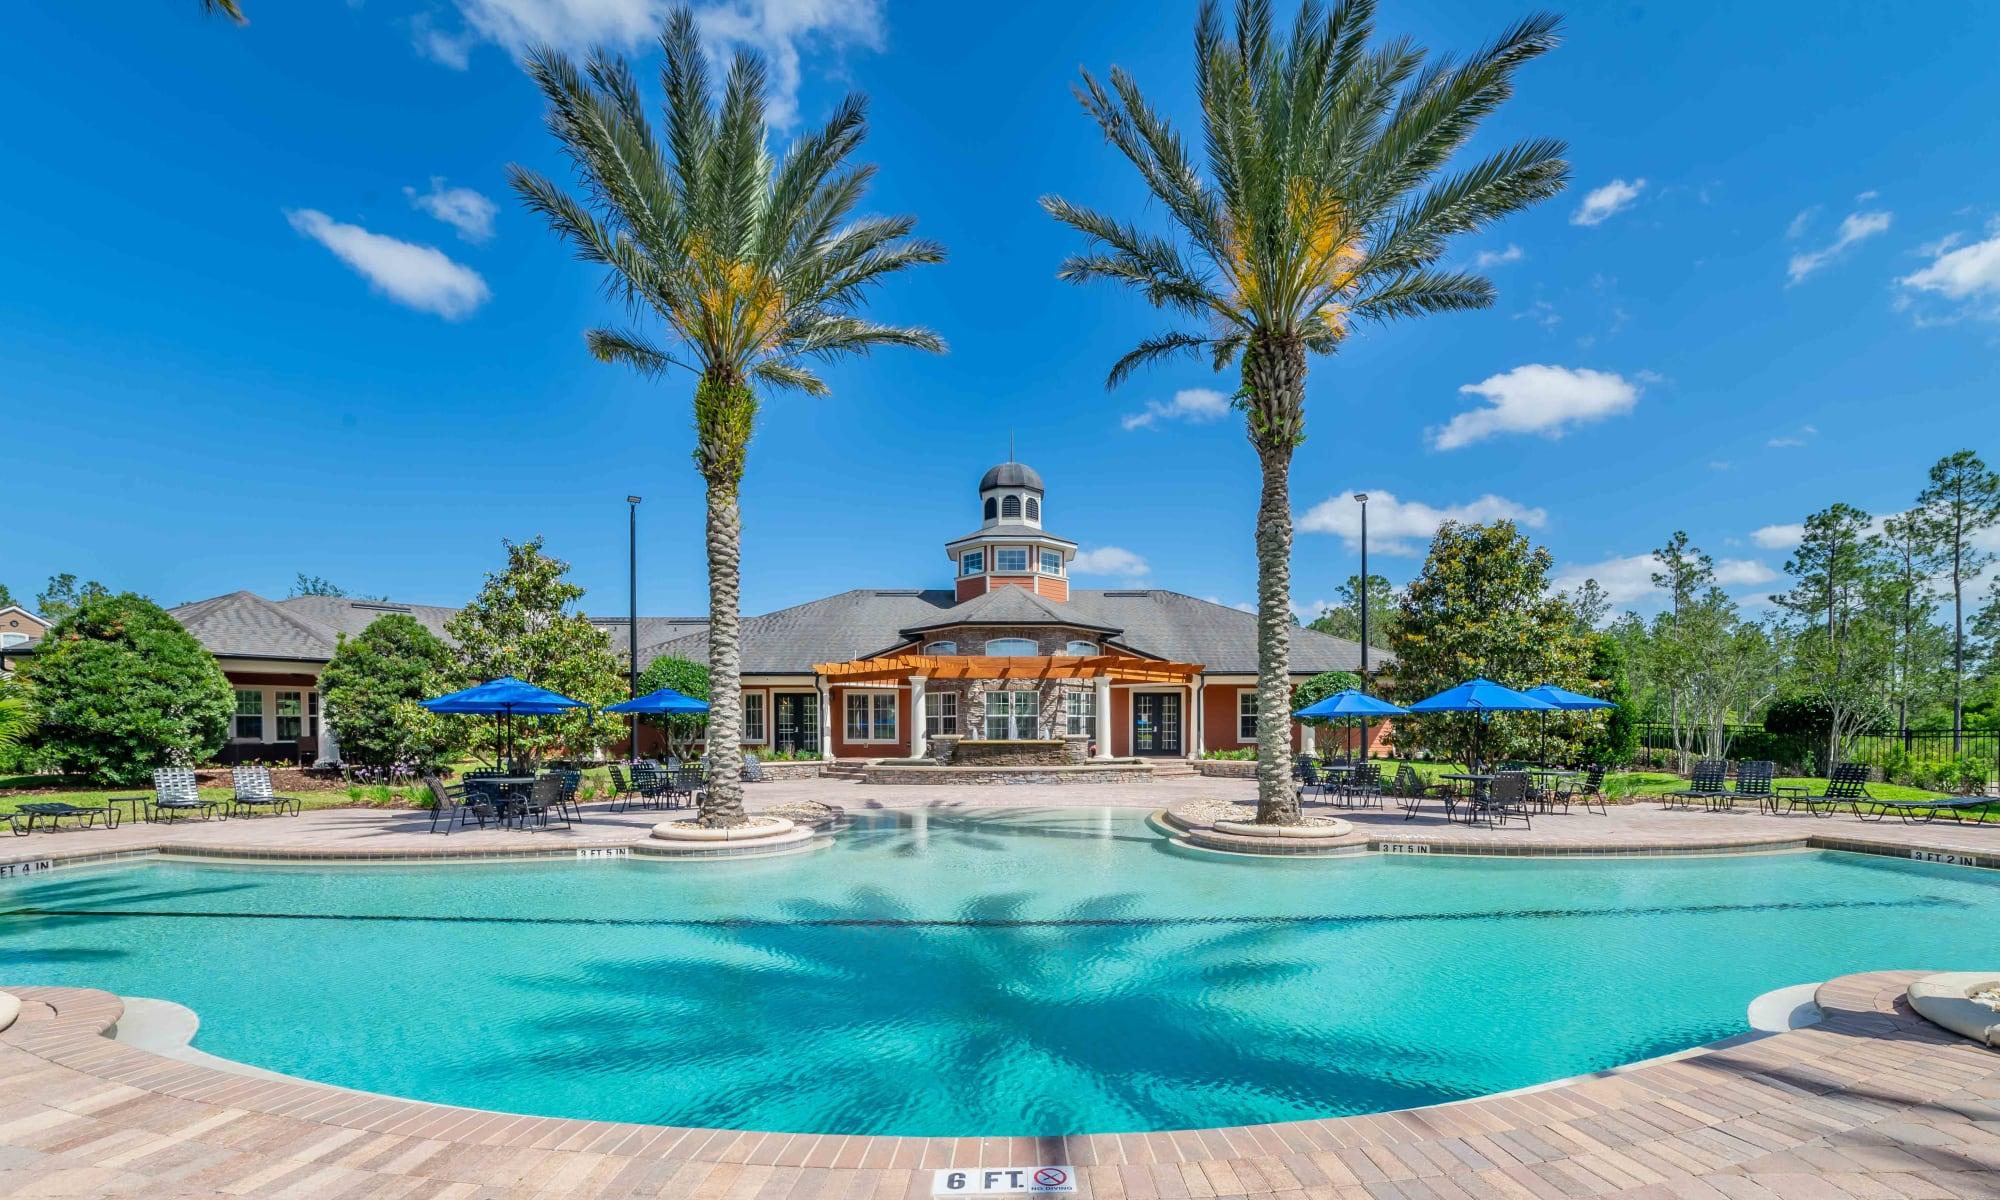 Seminole Woods Palm Coast Fl Apartments For Rent Integra Woods